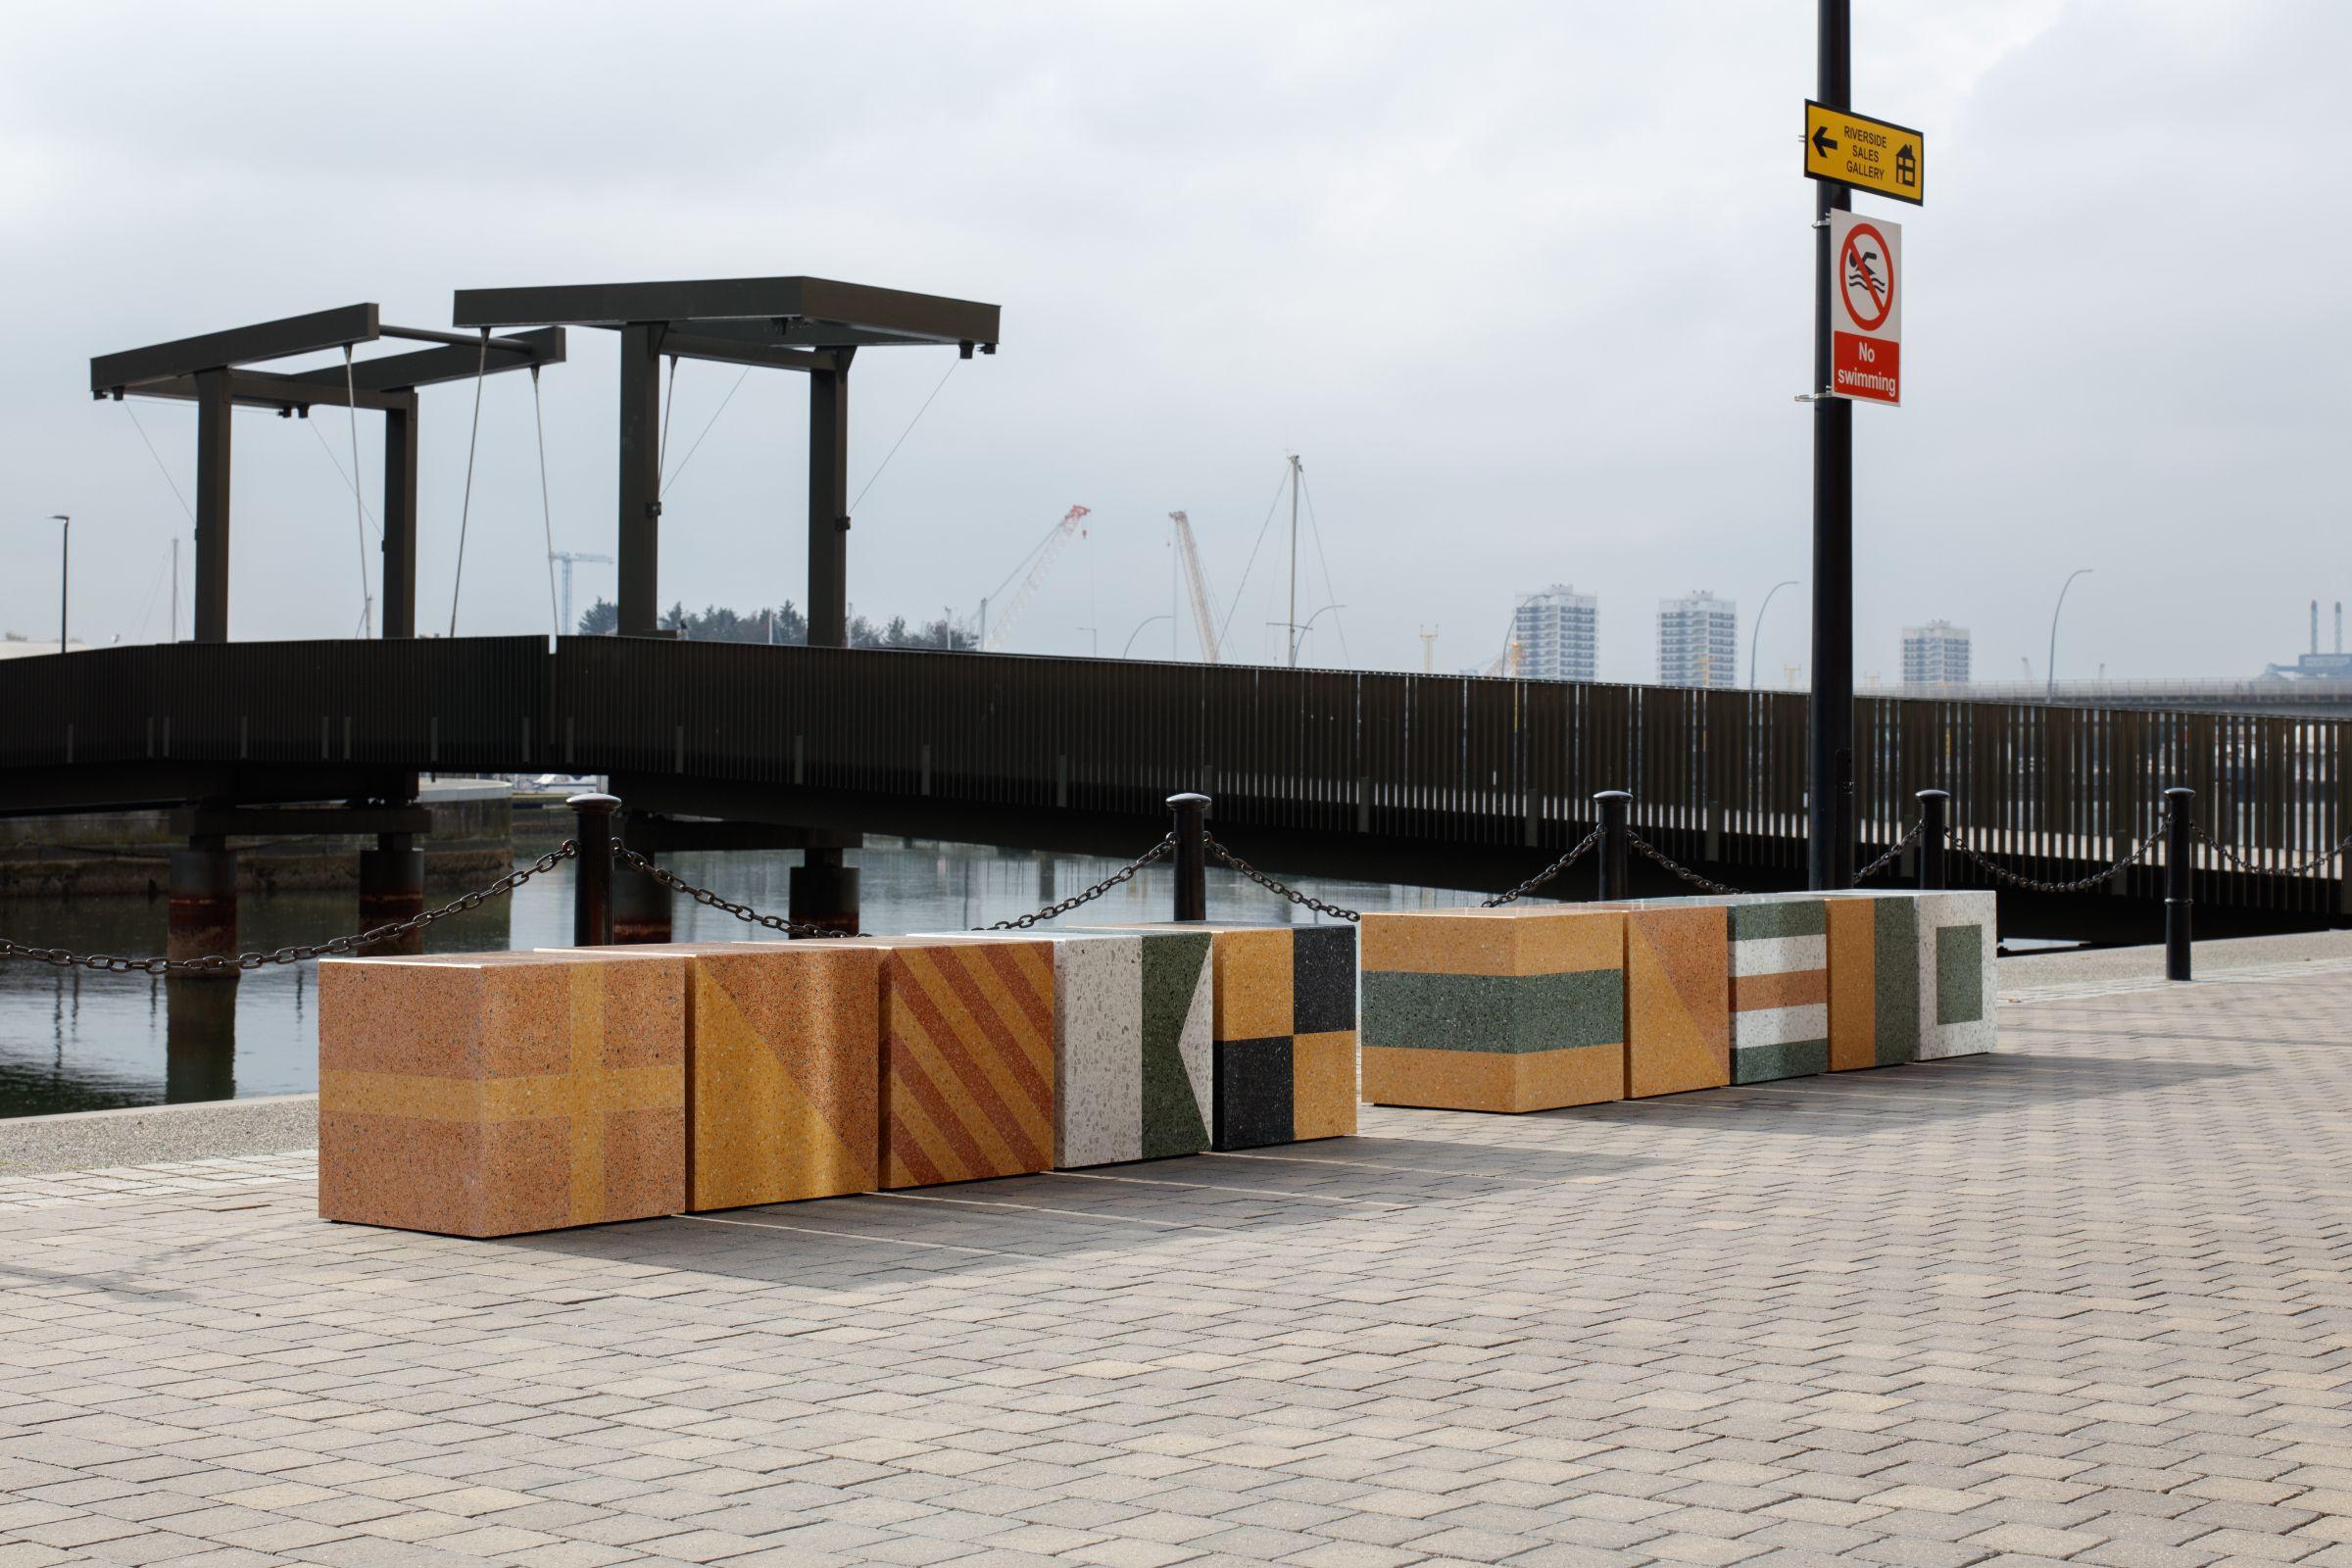 Parallel Collective's Semaphore sculpture